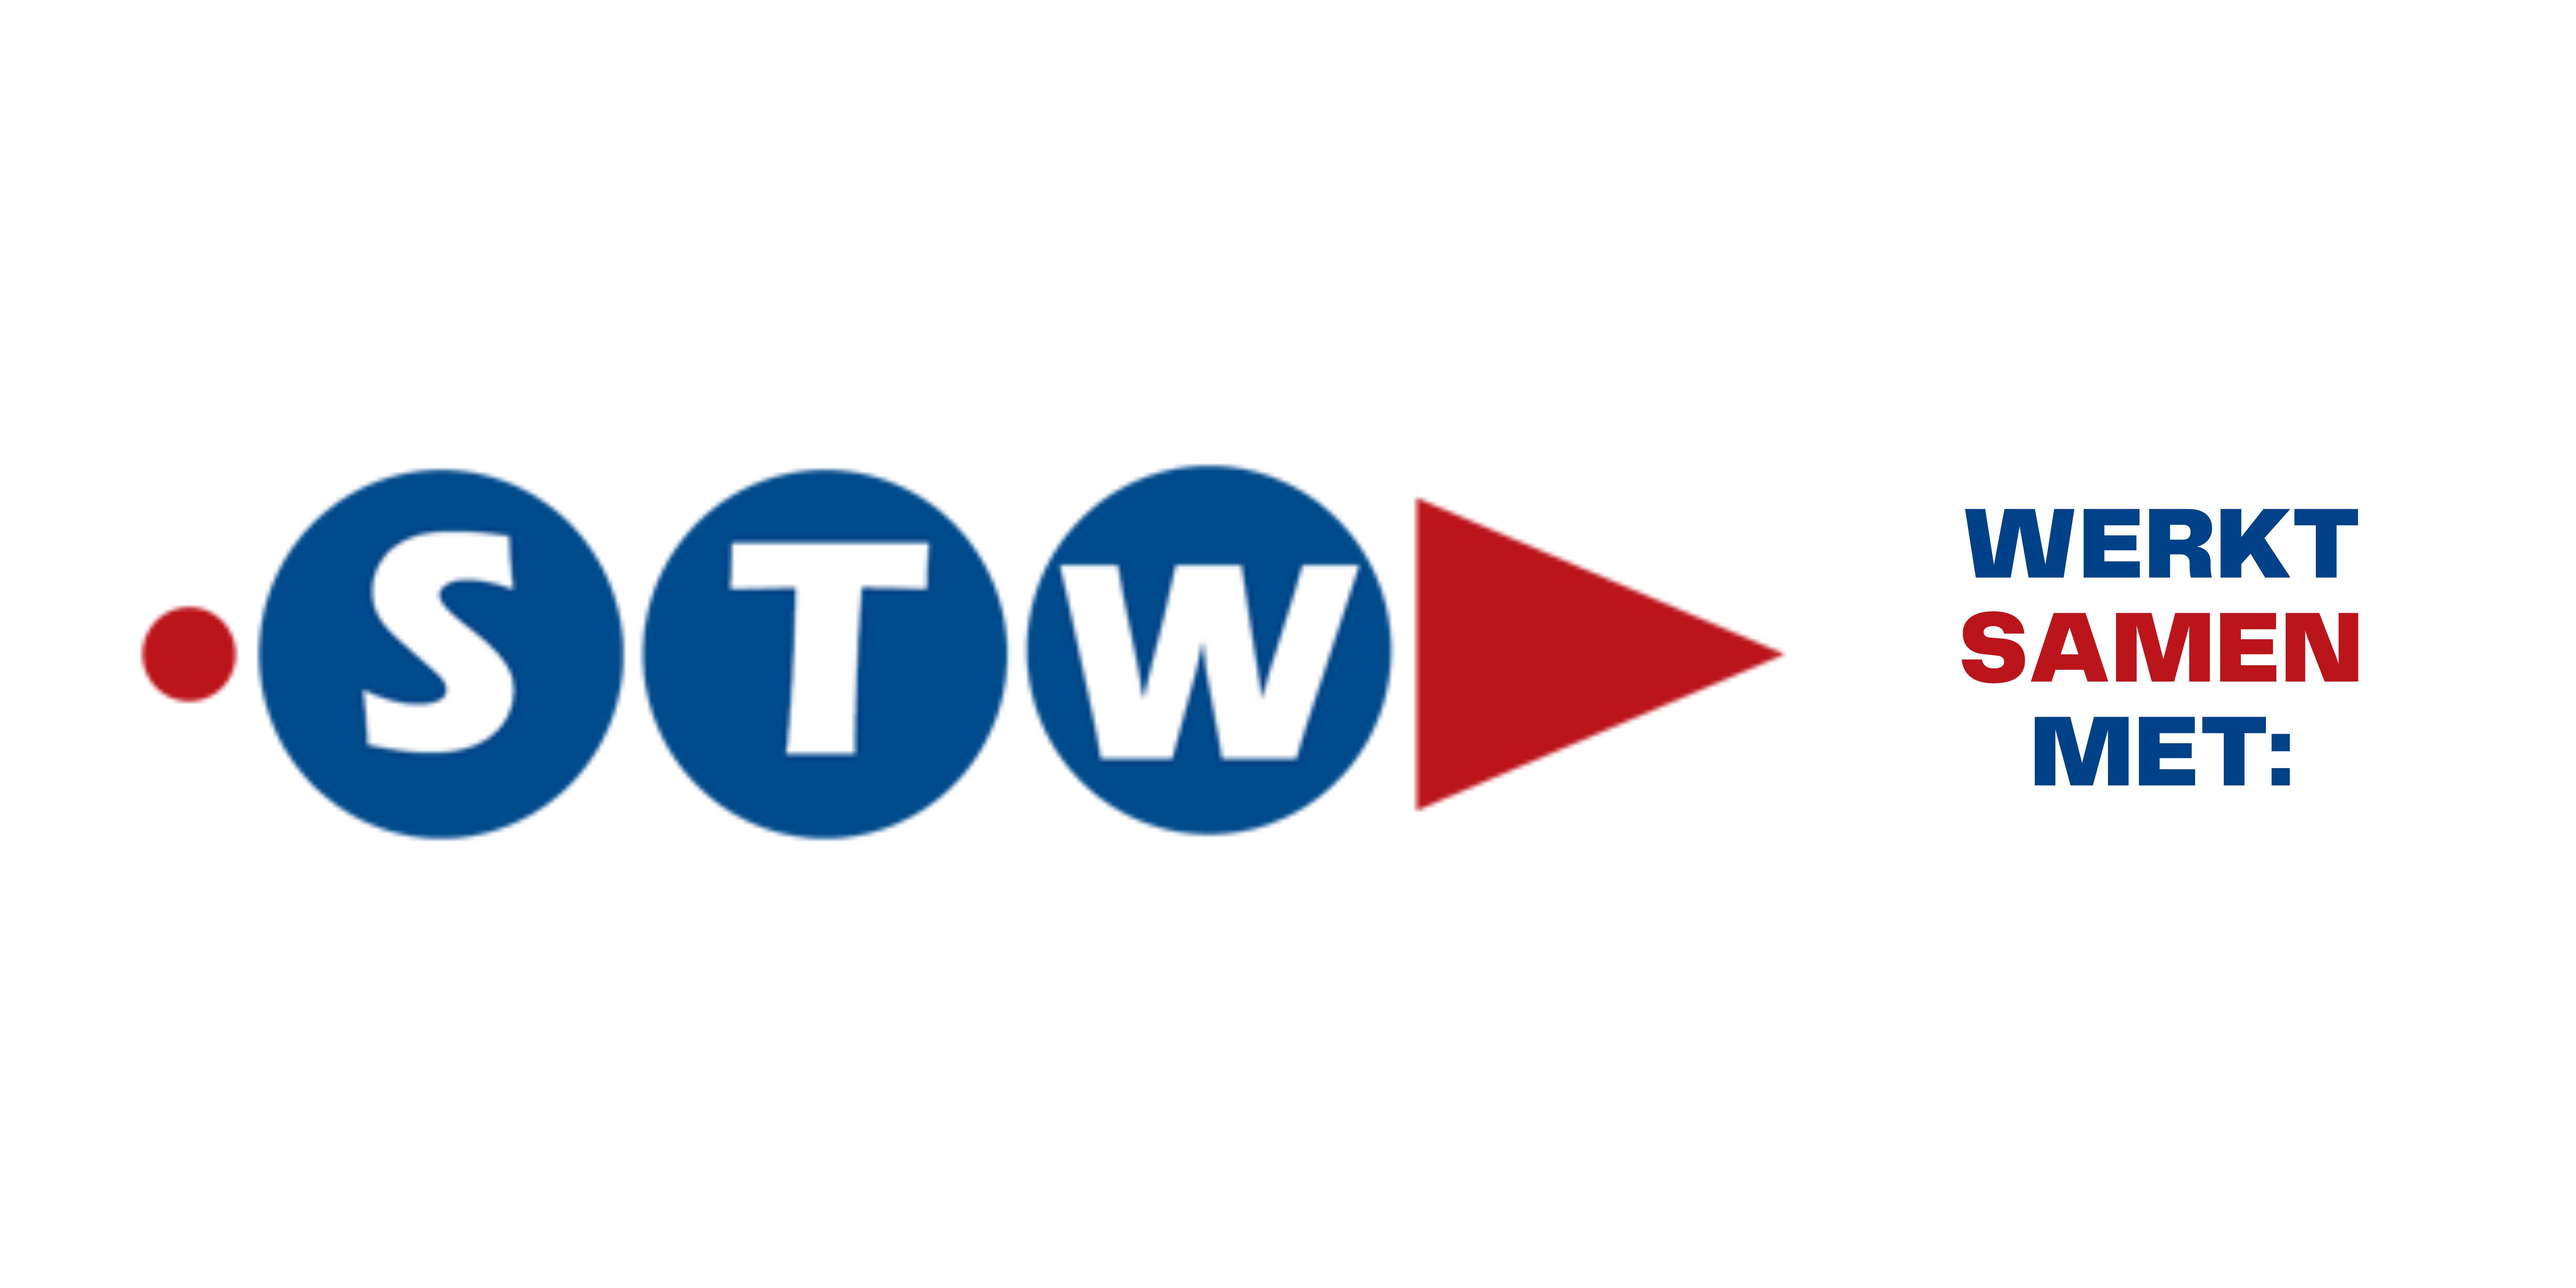 Banner site STW werkt samen met